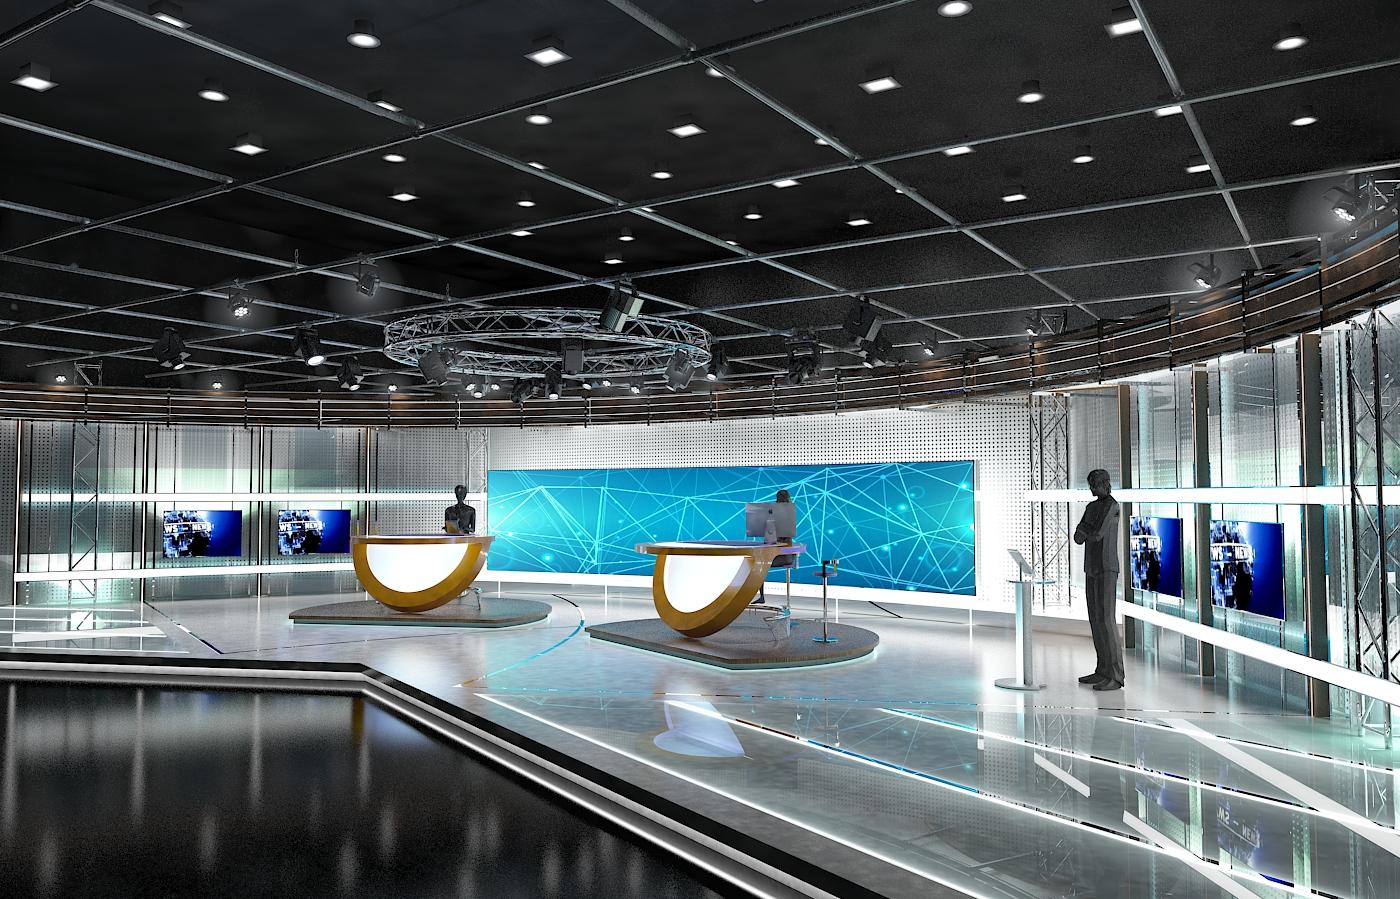 виртуал телевизийн студи цуглуулга vol 6 3d загвар max dxf dwg fbx obj 223395